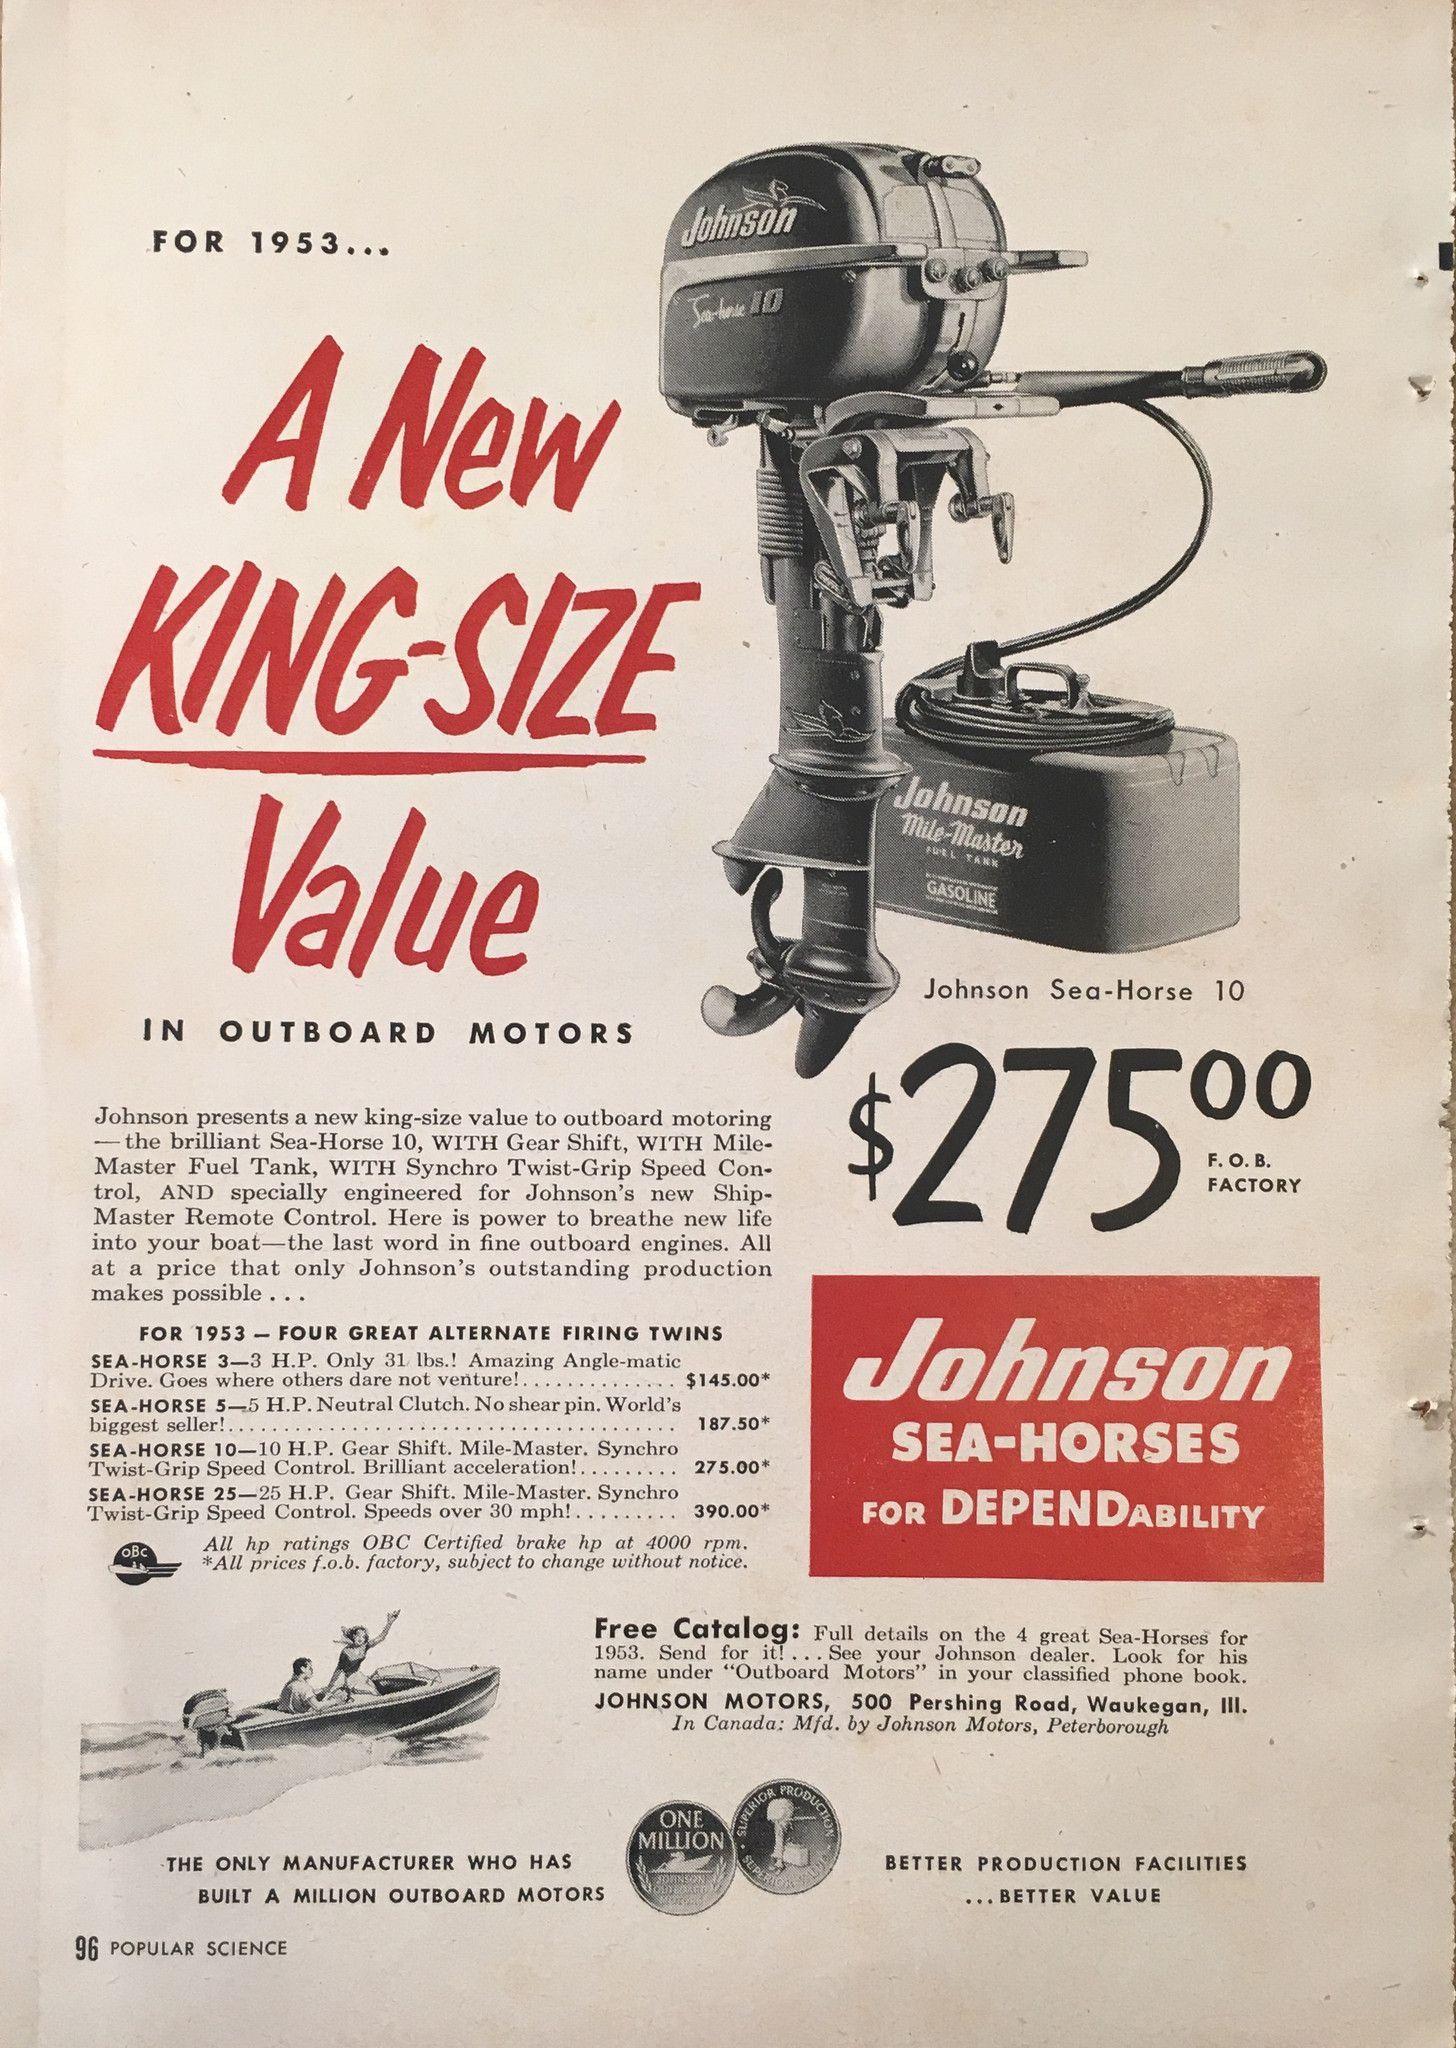 medium resolution of 1953 johnson outboard motors vintage magazine ad from popular science